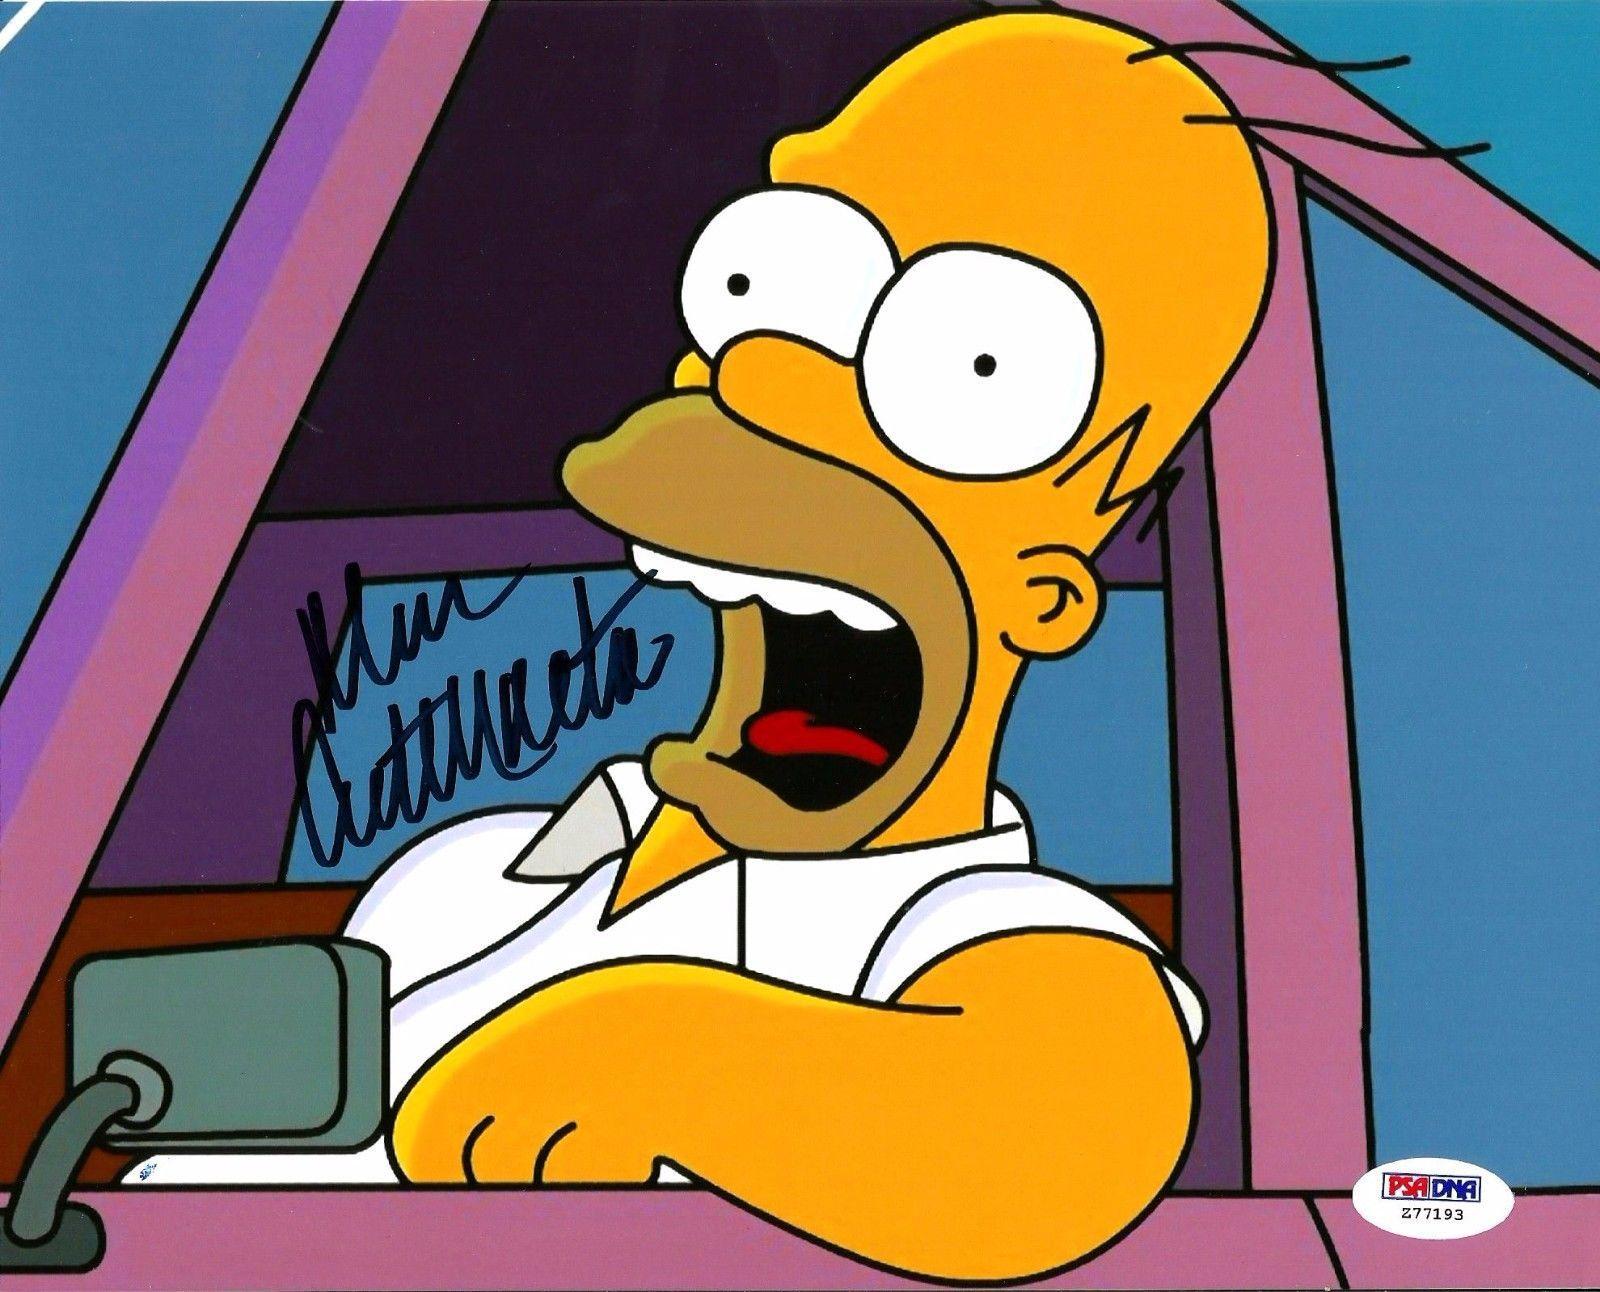 Dan Castellaneta The Simpsons Homer Simpson Signed Auto 8x10 PSA/DNA COA #2